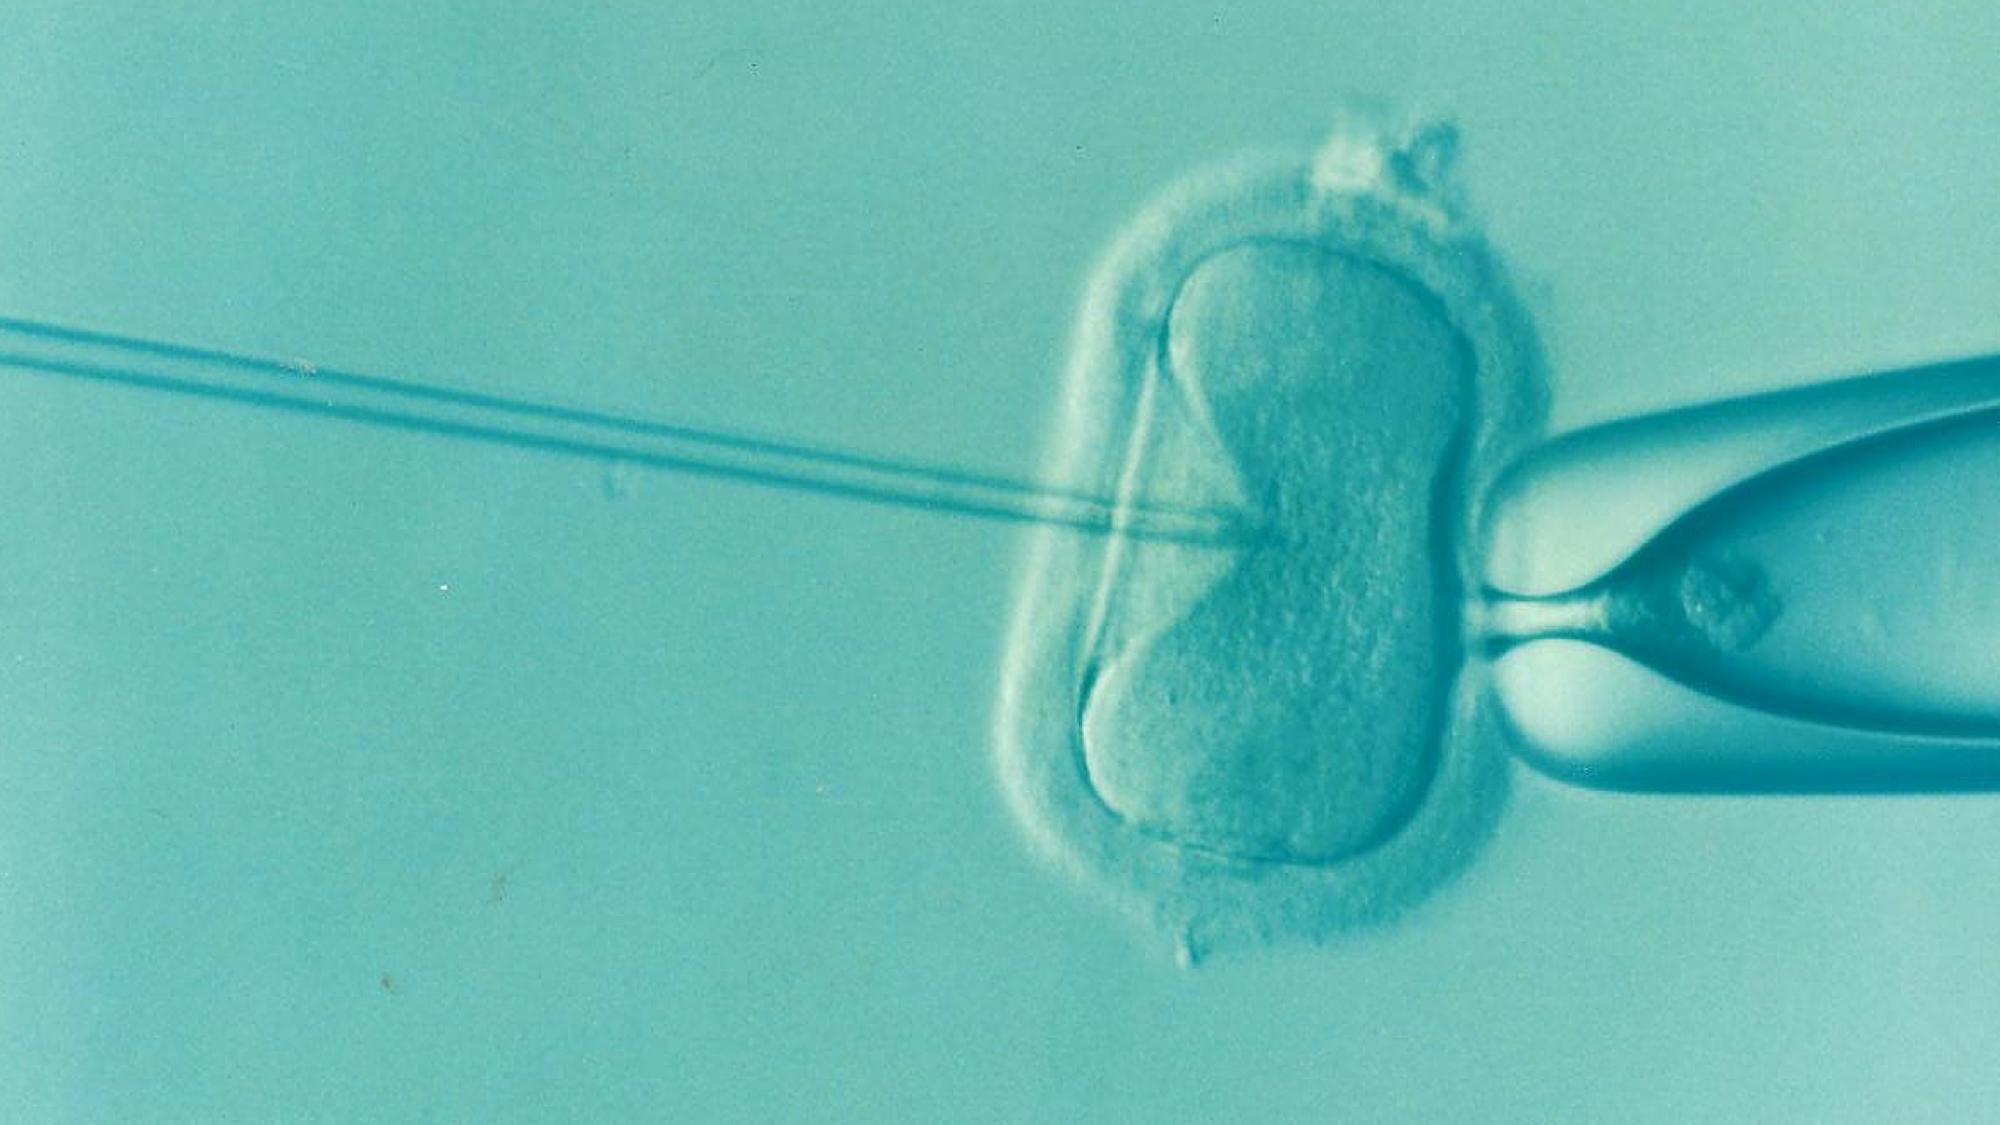 In vitro fertilization (Picture by DrKontogianniIVF from Pixabay).